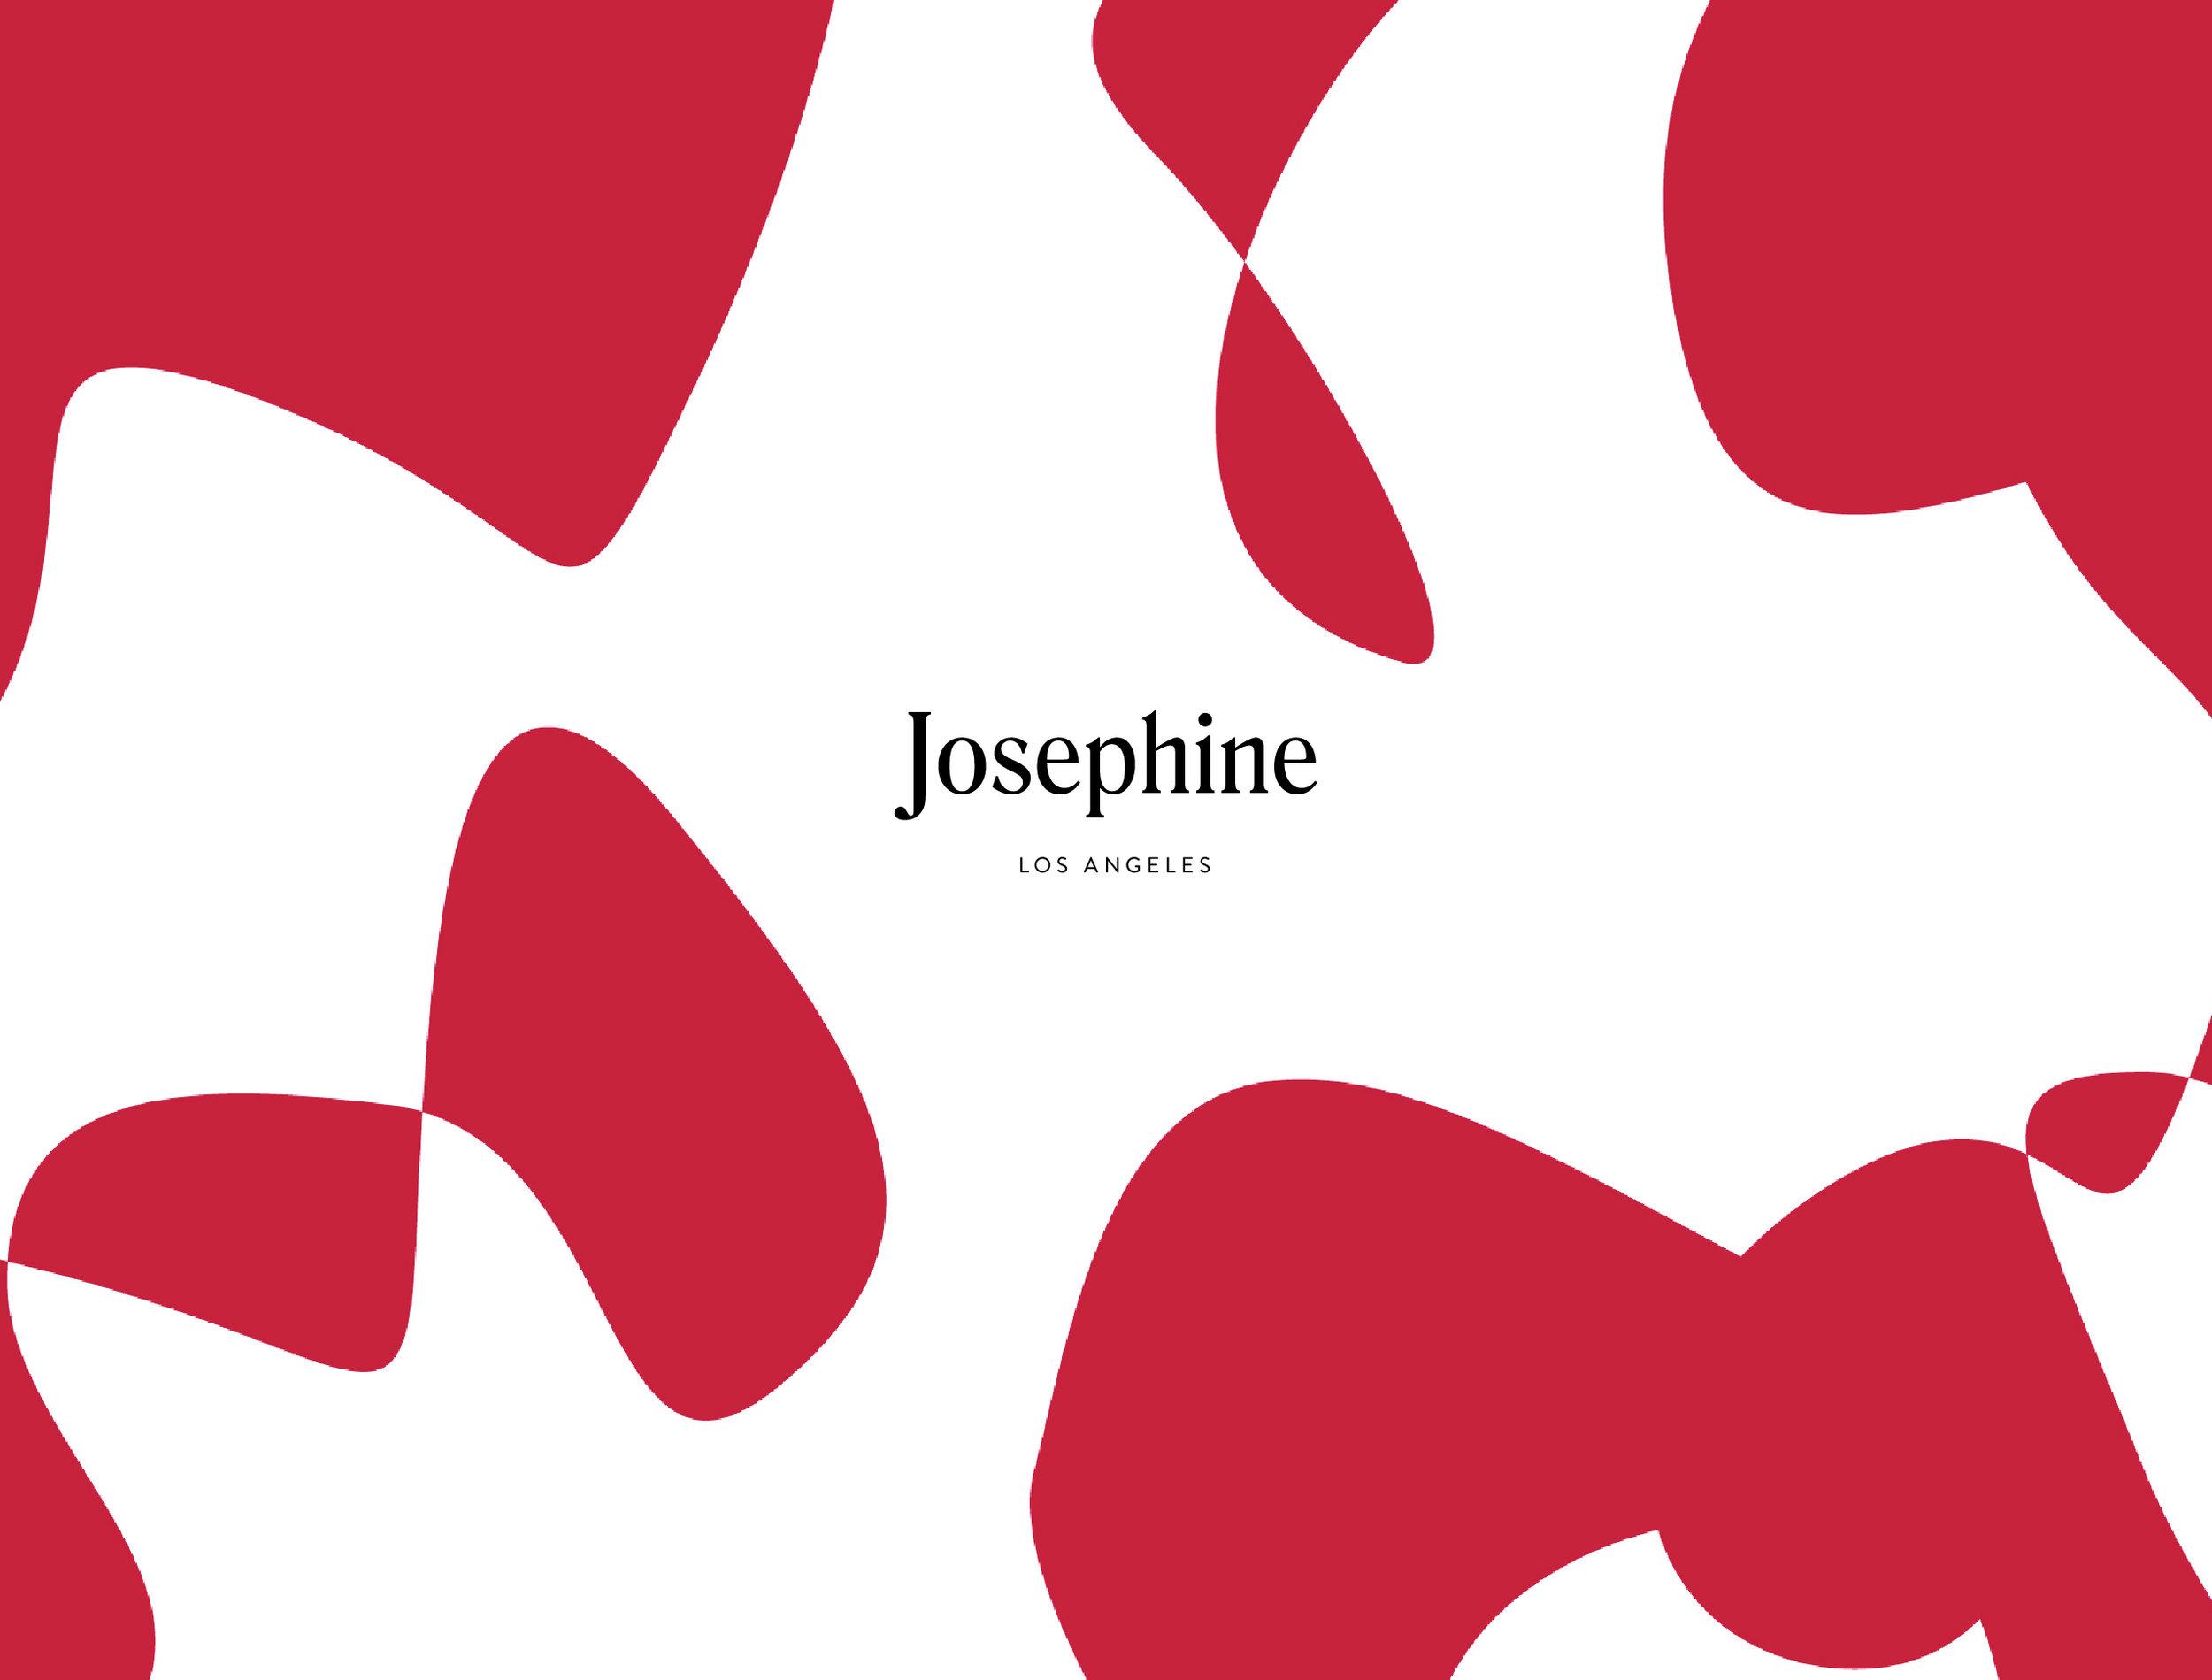 josephine LA-01-01.jpg